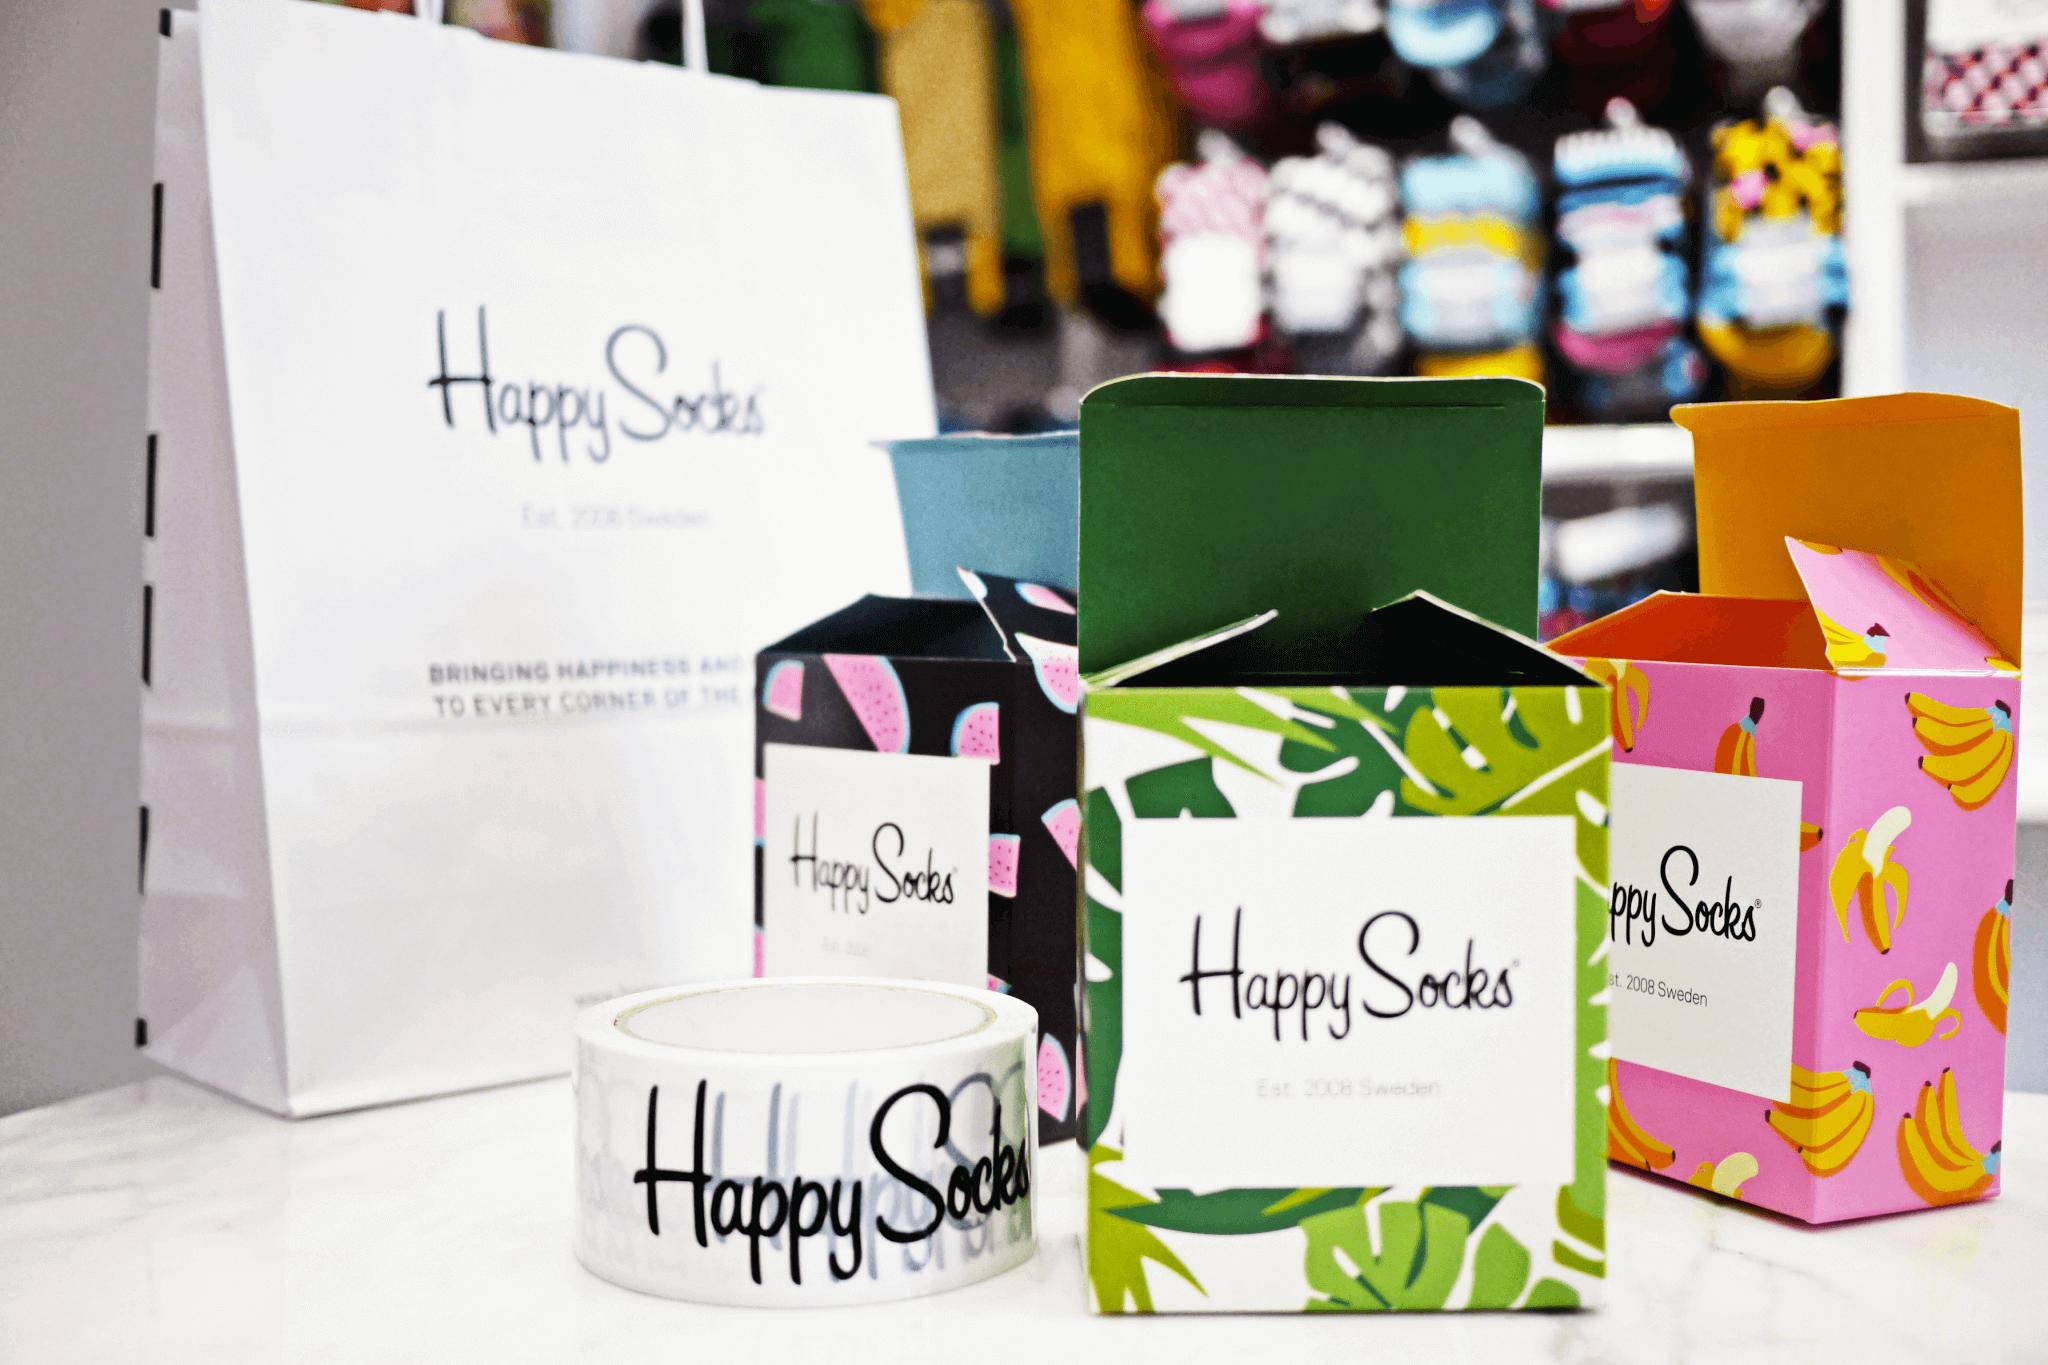 Kartonové obaly produktové boxy